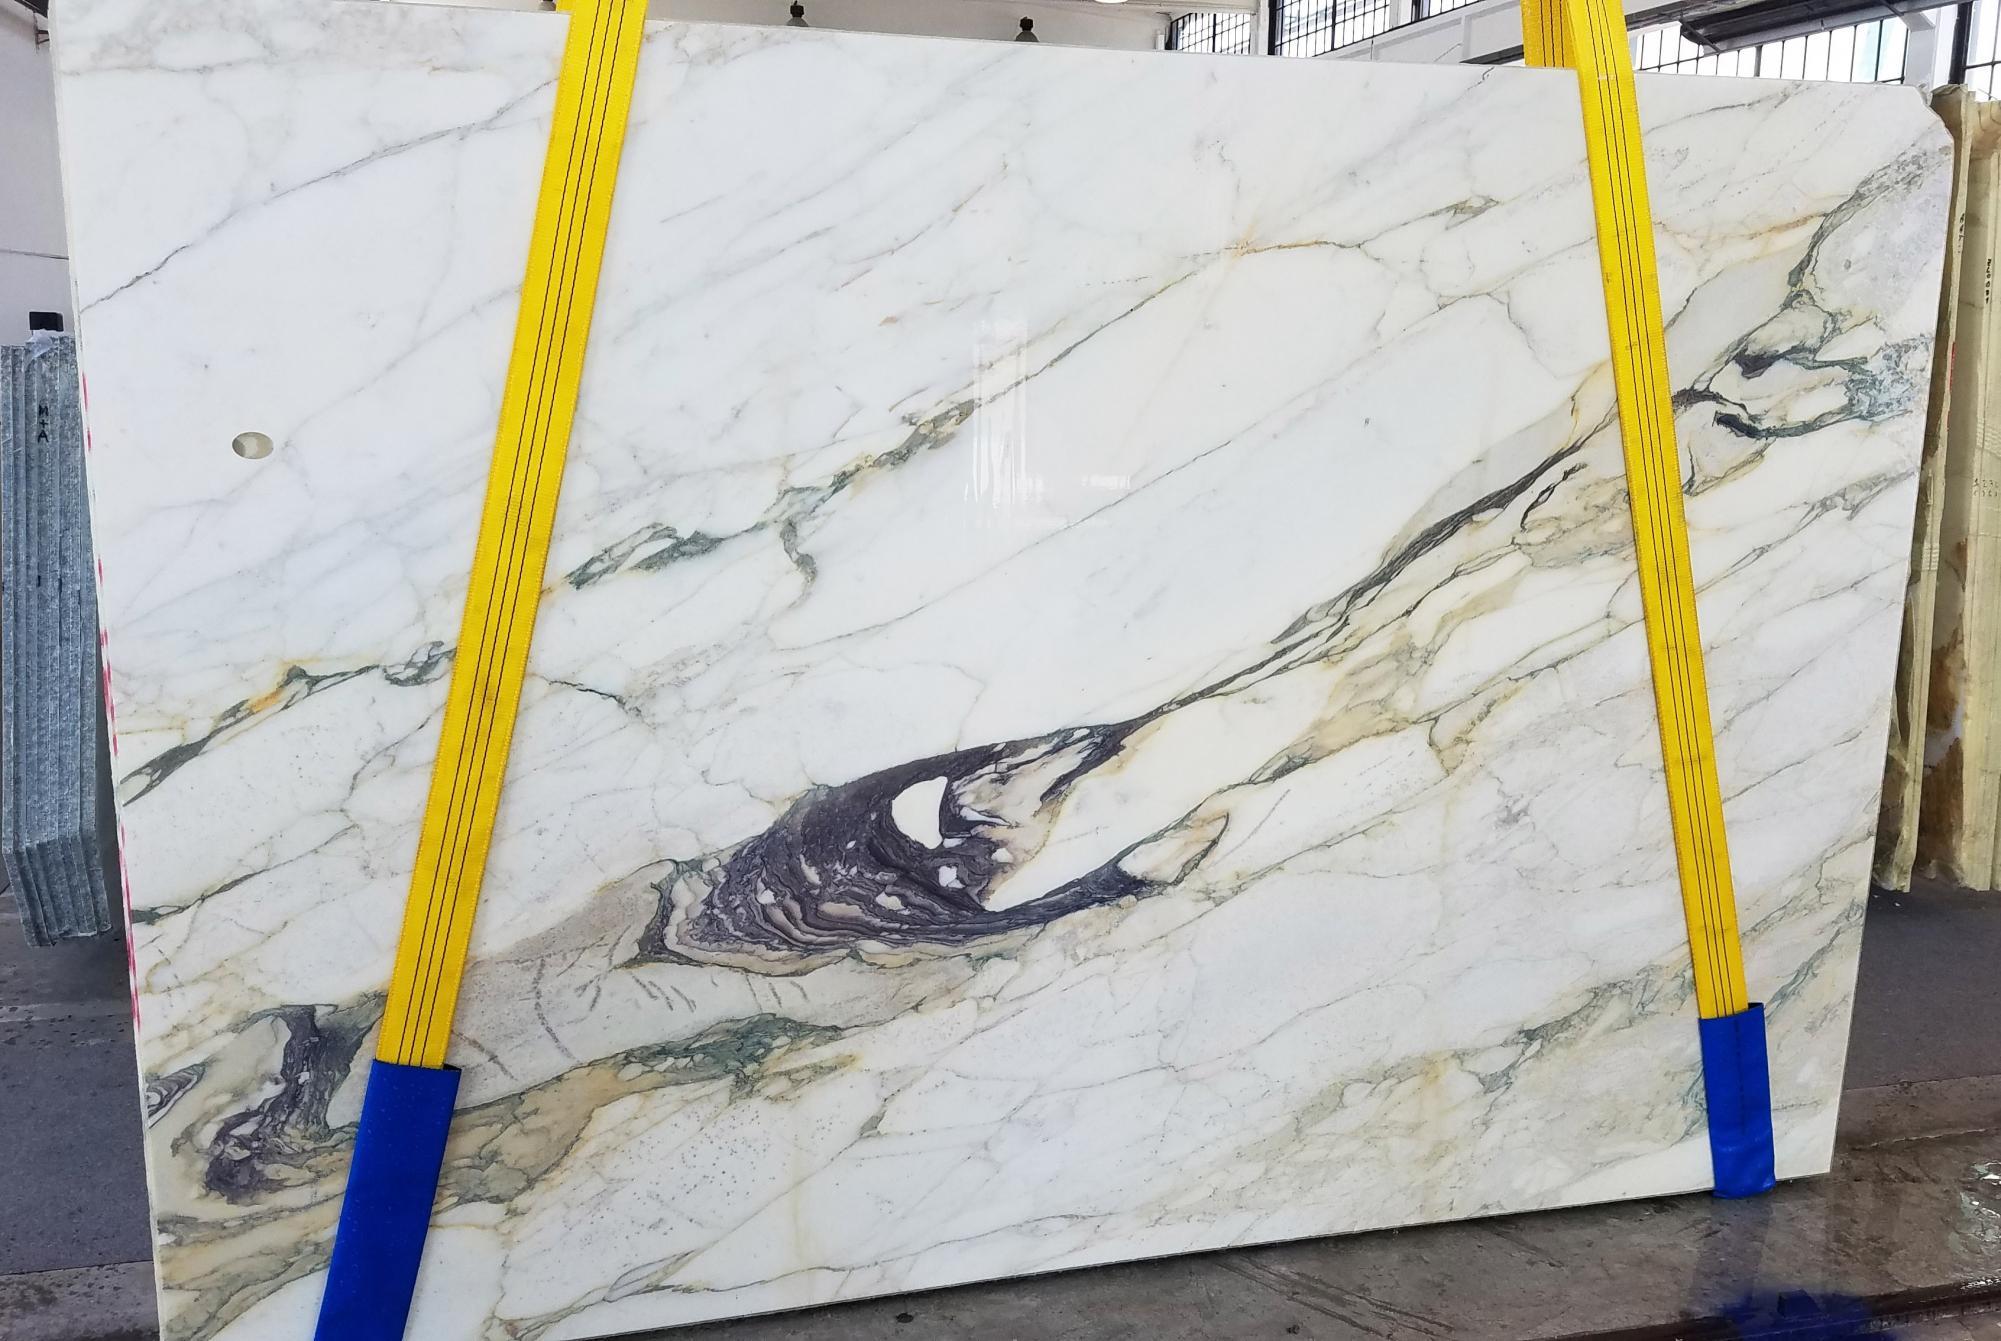 CALACATTA FIORITO Supply Veneto (Italy) sawn slabs U0433 , Slab #08 natural marble